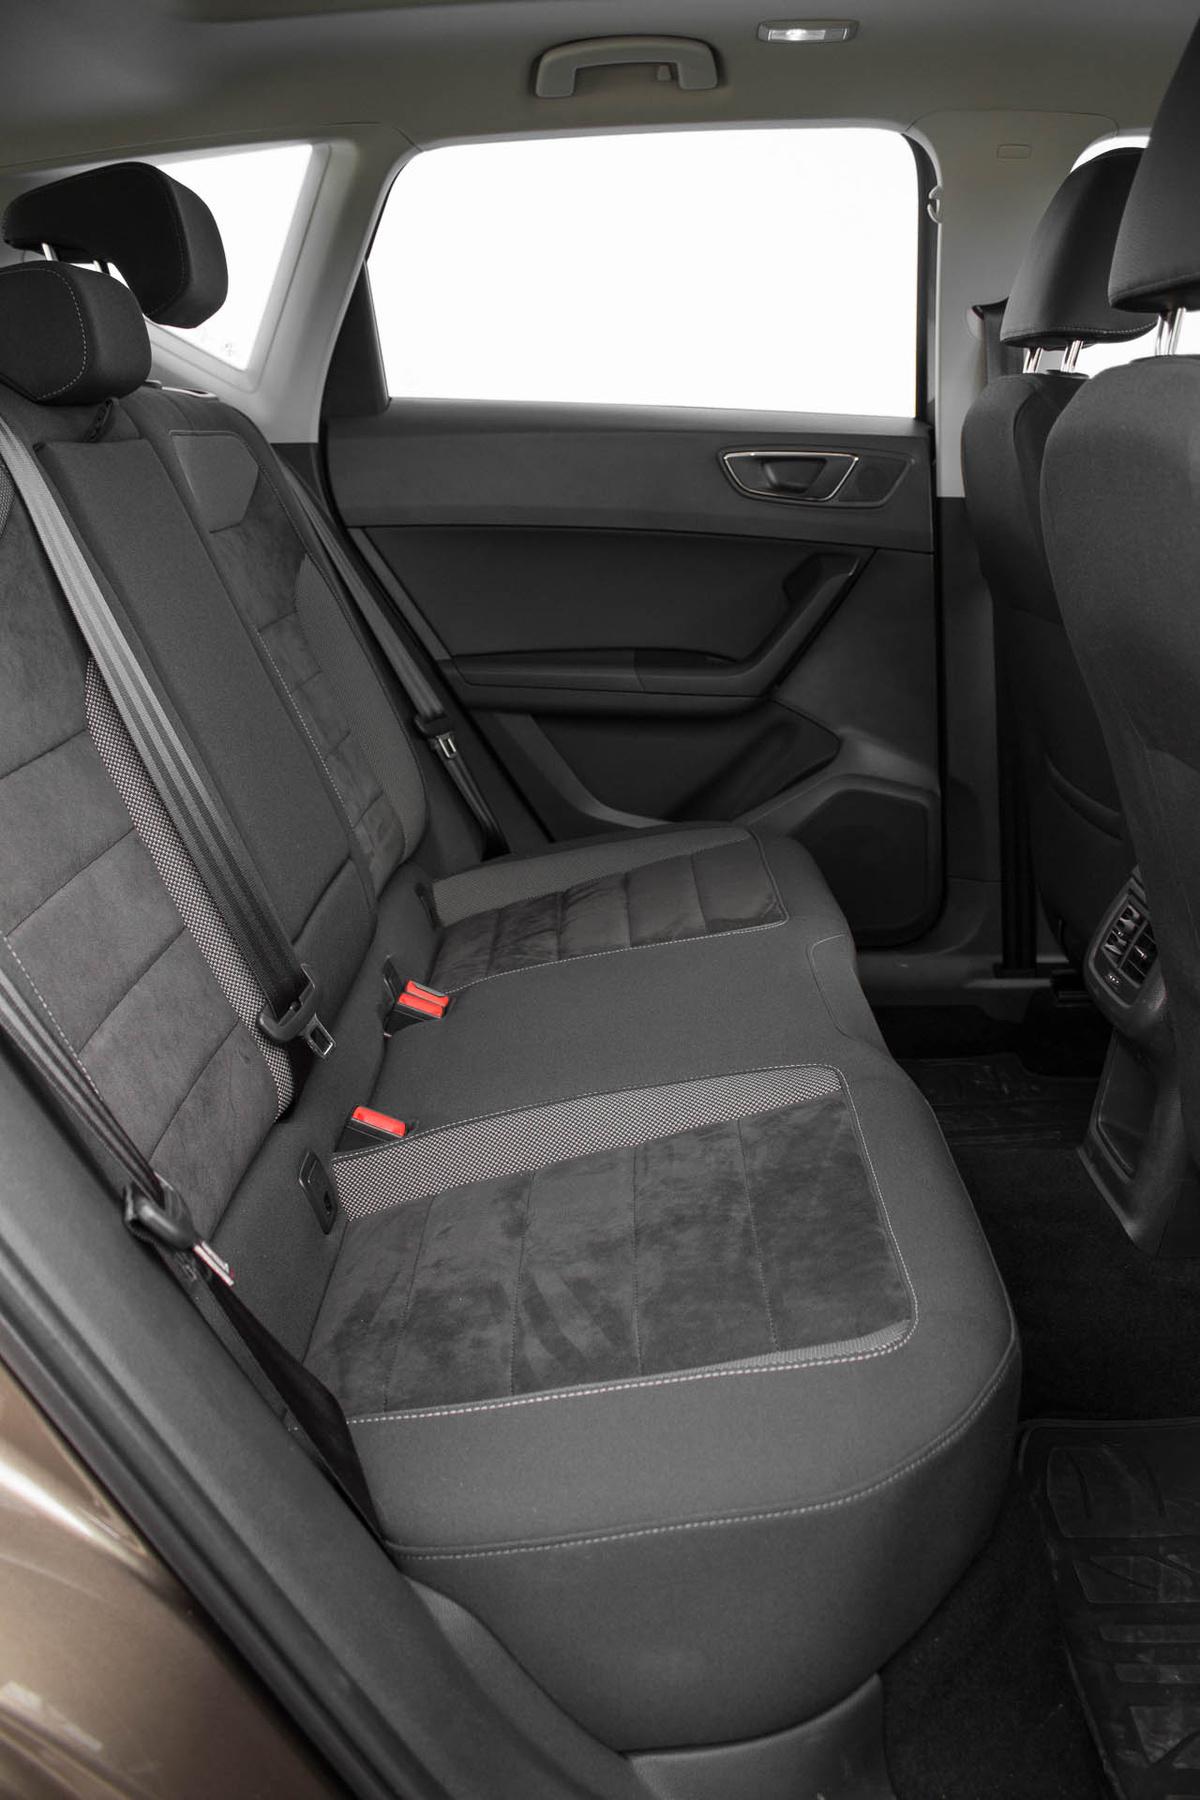 Audi magatol leparkol 658 - Sd K Rty R L K Pek T Lthet K Az Atec Ra Amit Azt N A K Zponti Kijelz N B Ng Szhet Nk